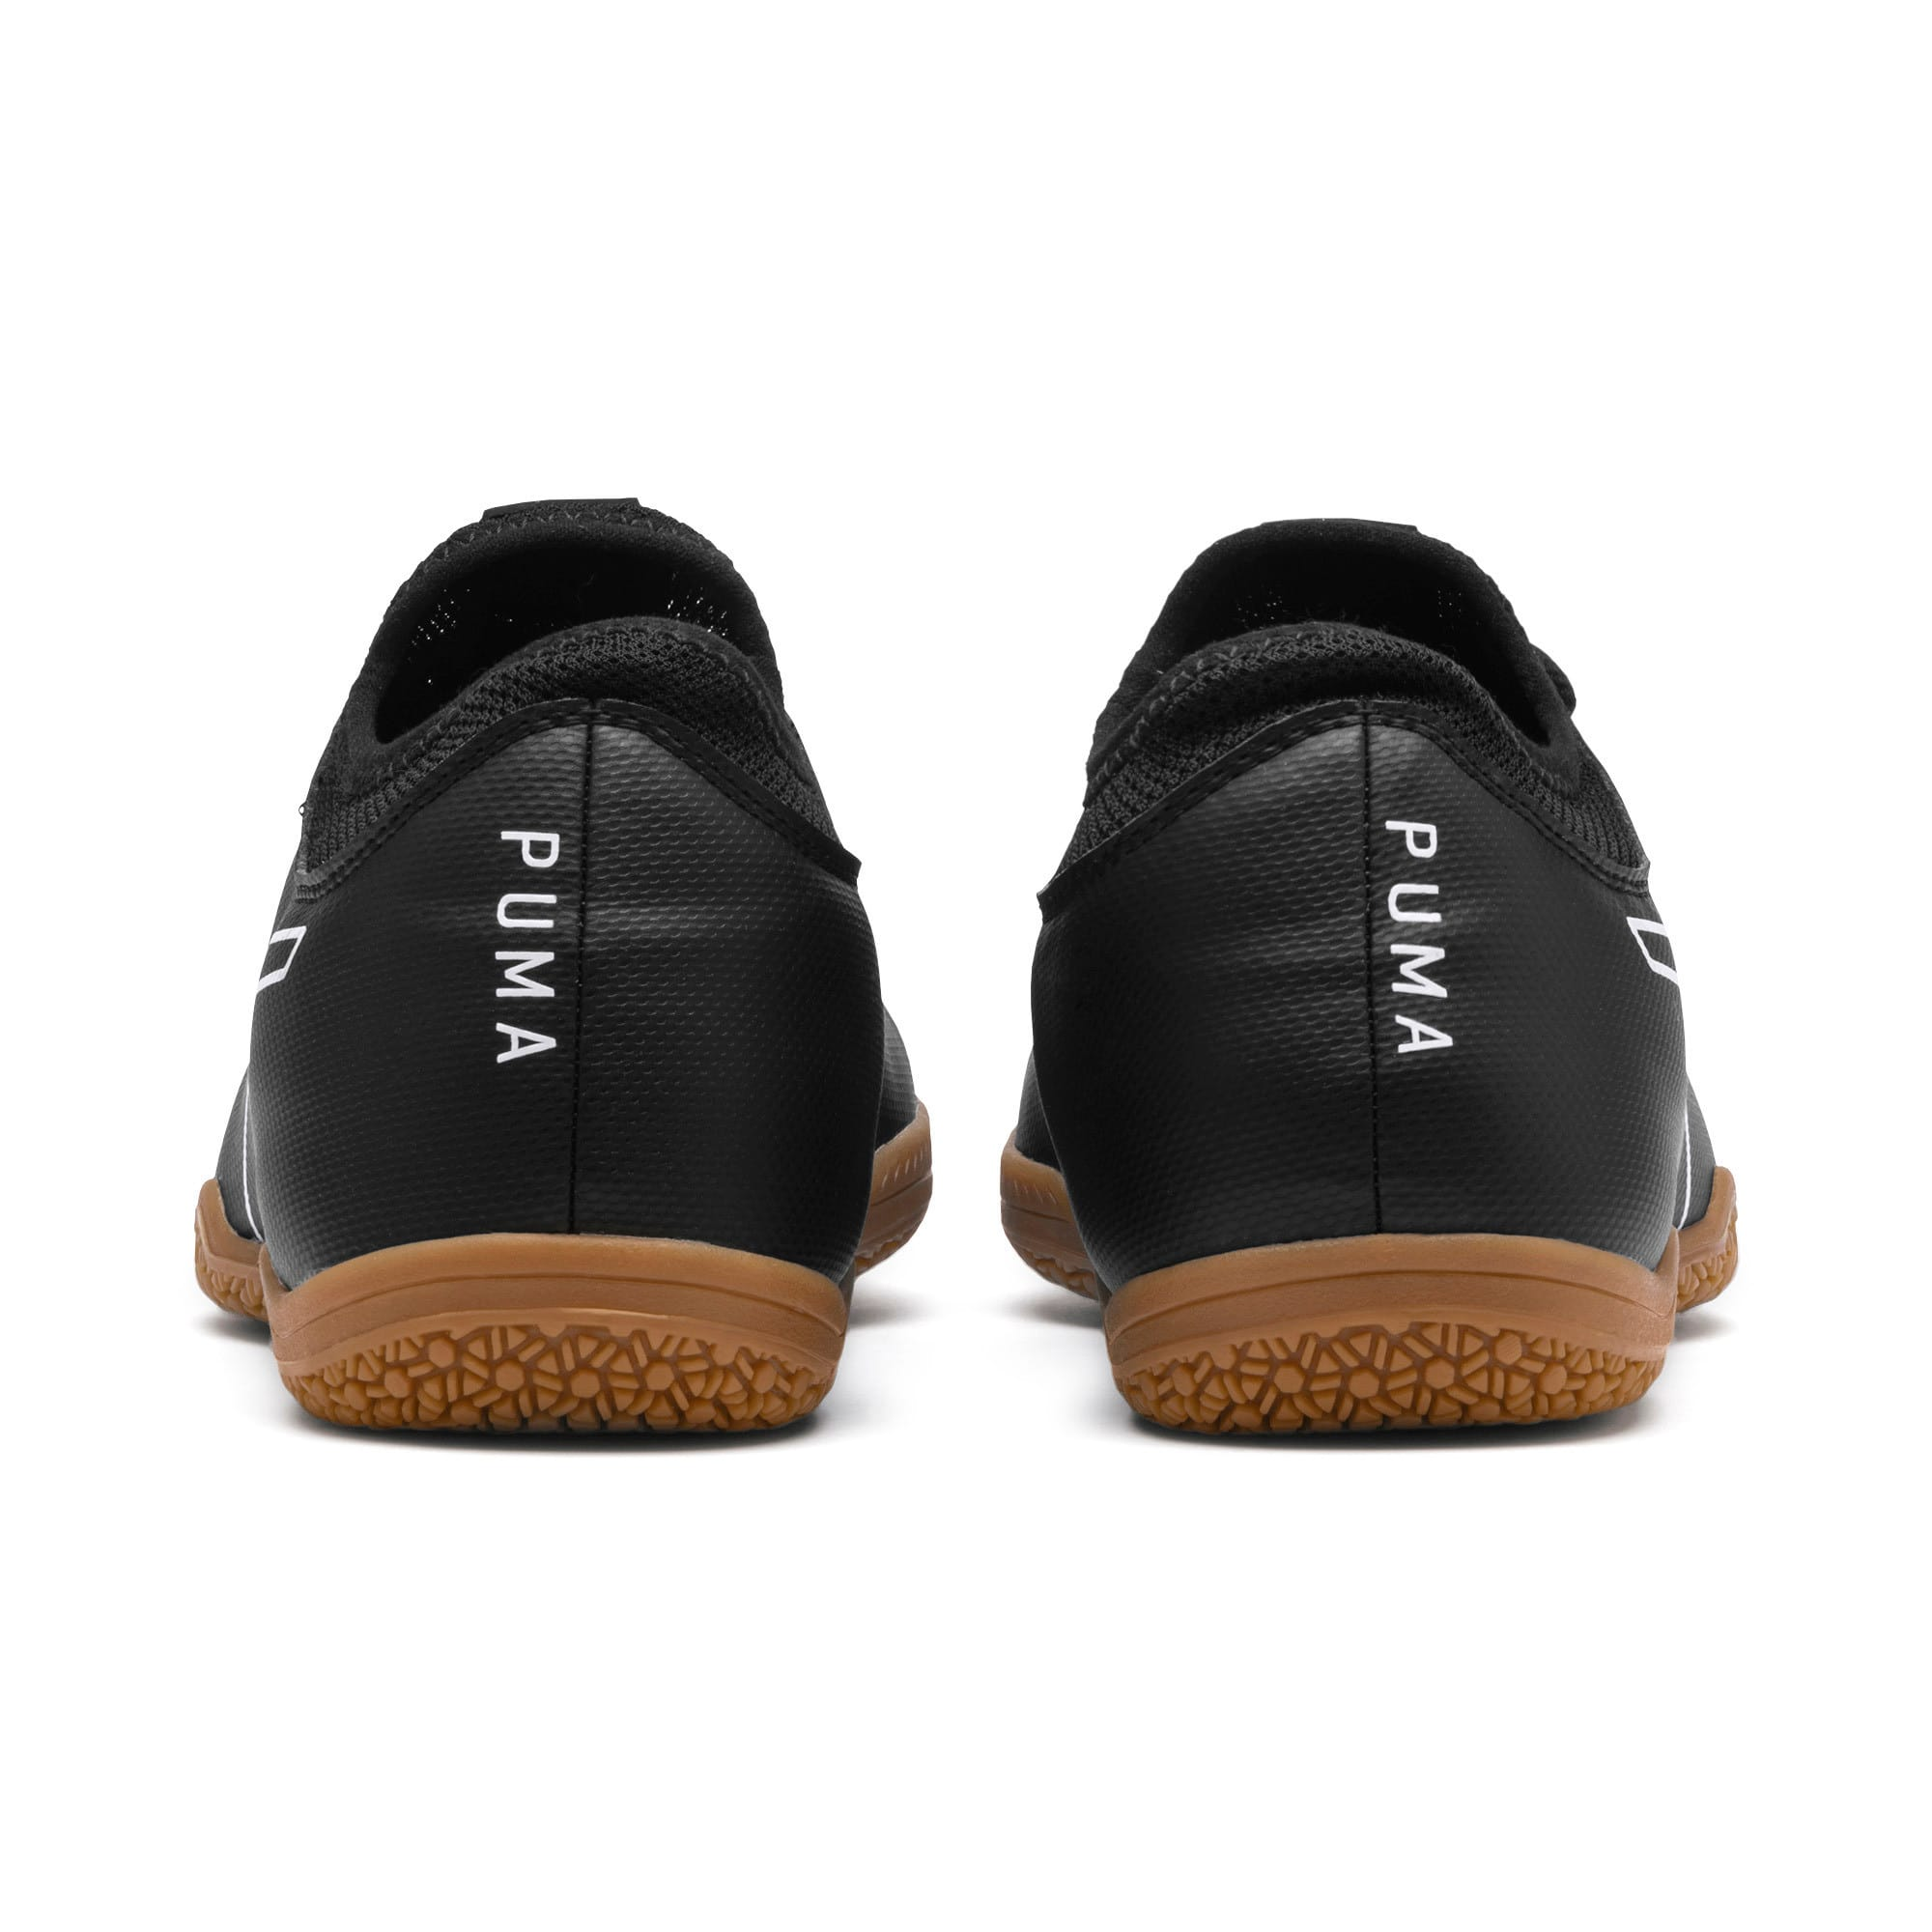 Thumbnail 4 of 365 Sala 2 Men's Football Boots, Puma Black-Puma White-Gum, medium